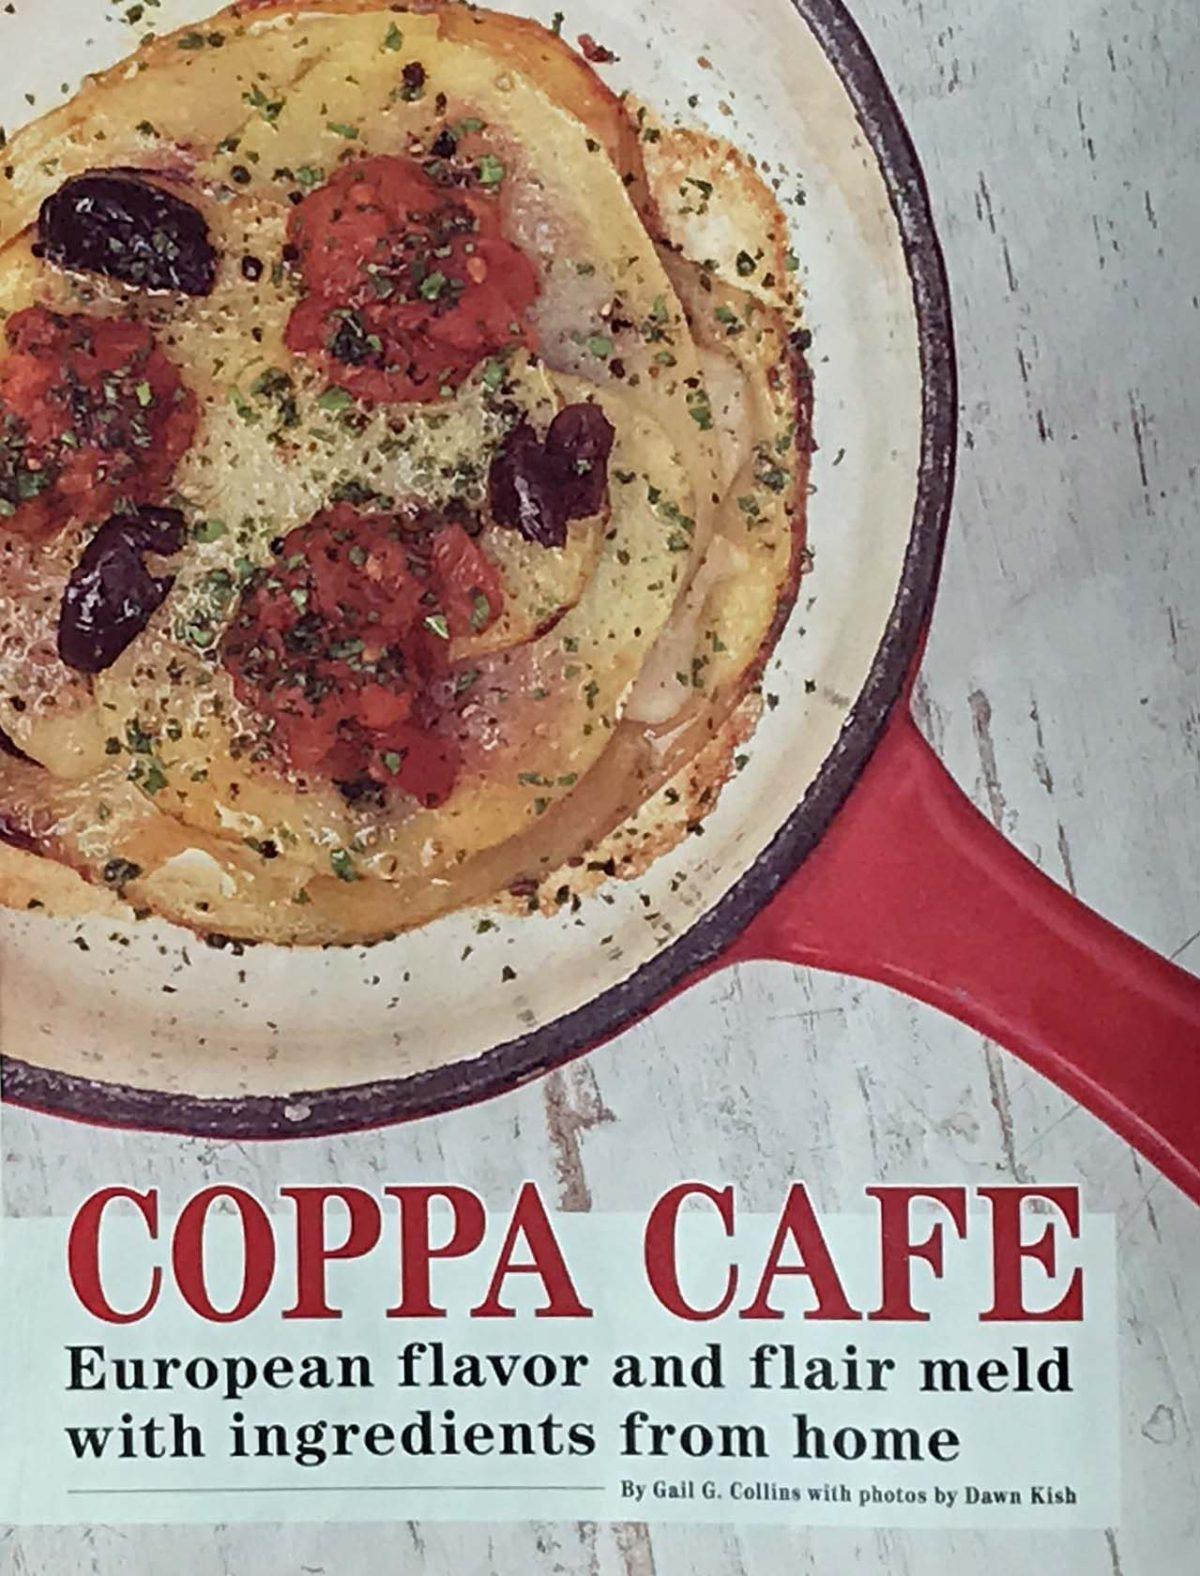 Coppa Café